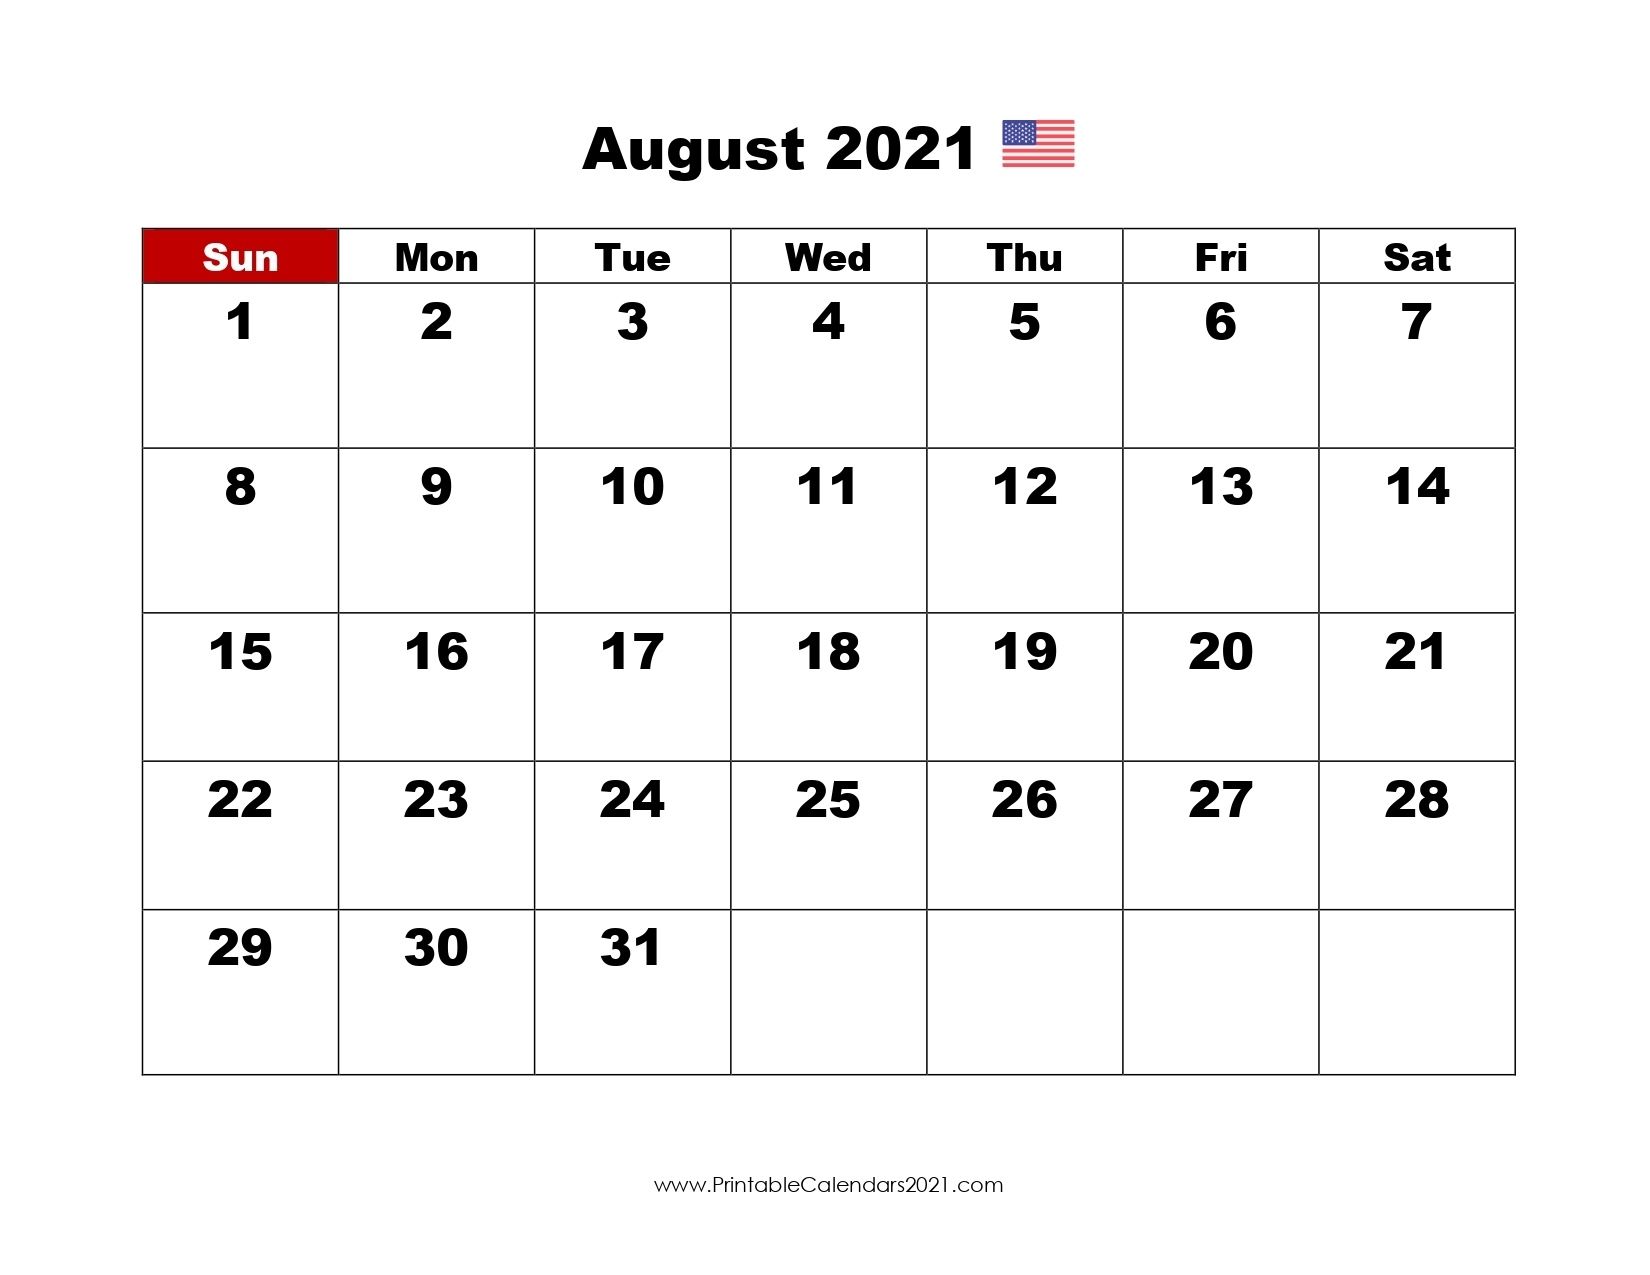 44+ August 2021 Calendar Printable, August 2021 Blank Calendar Pdf Blank August 2021 Calendar